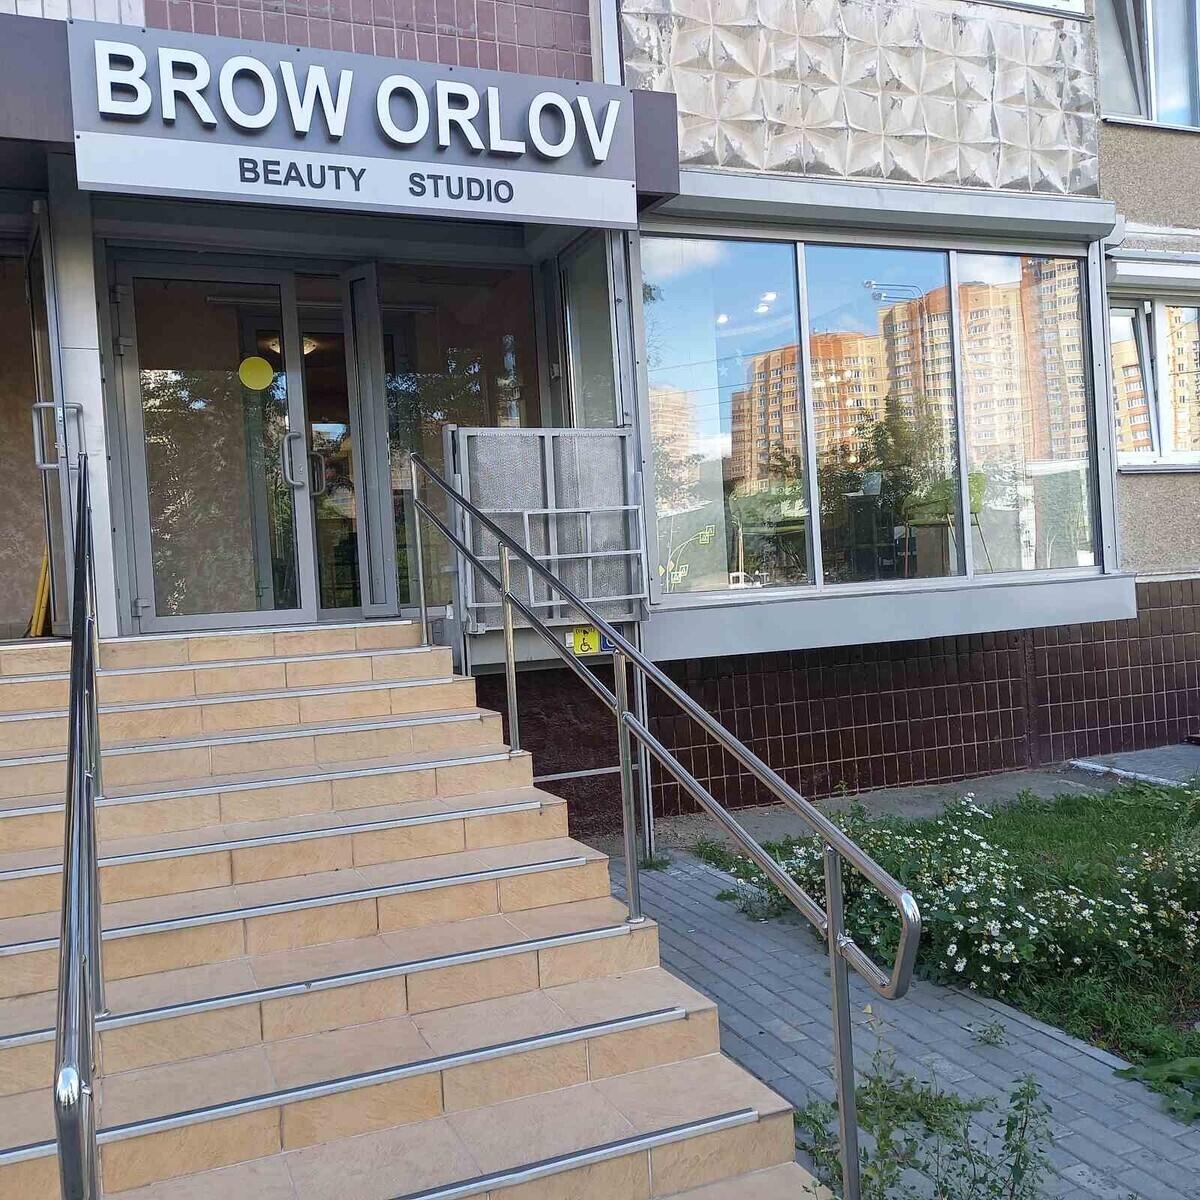 Brow Orlov